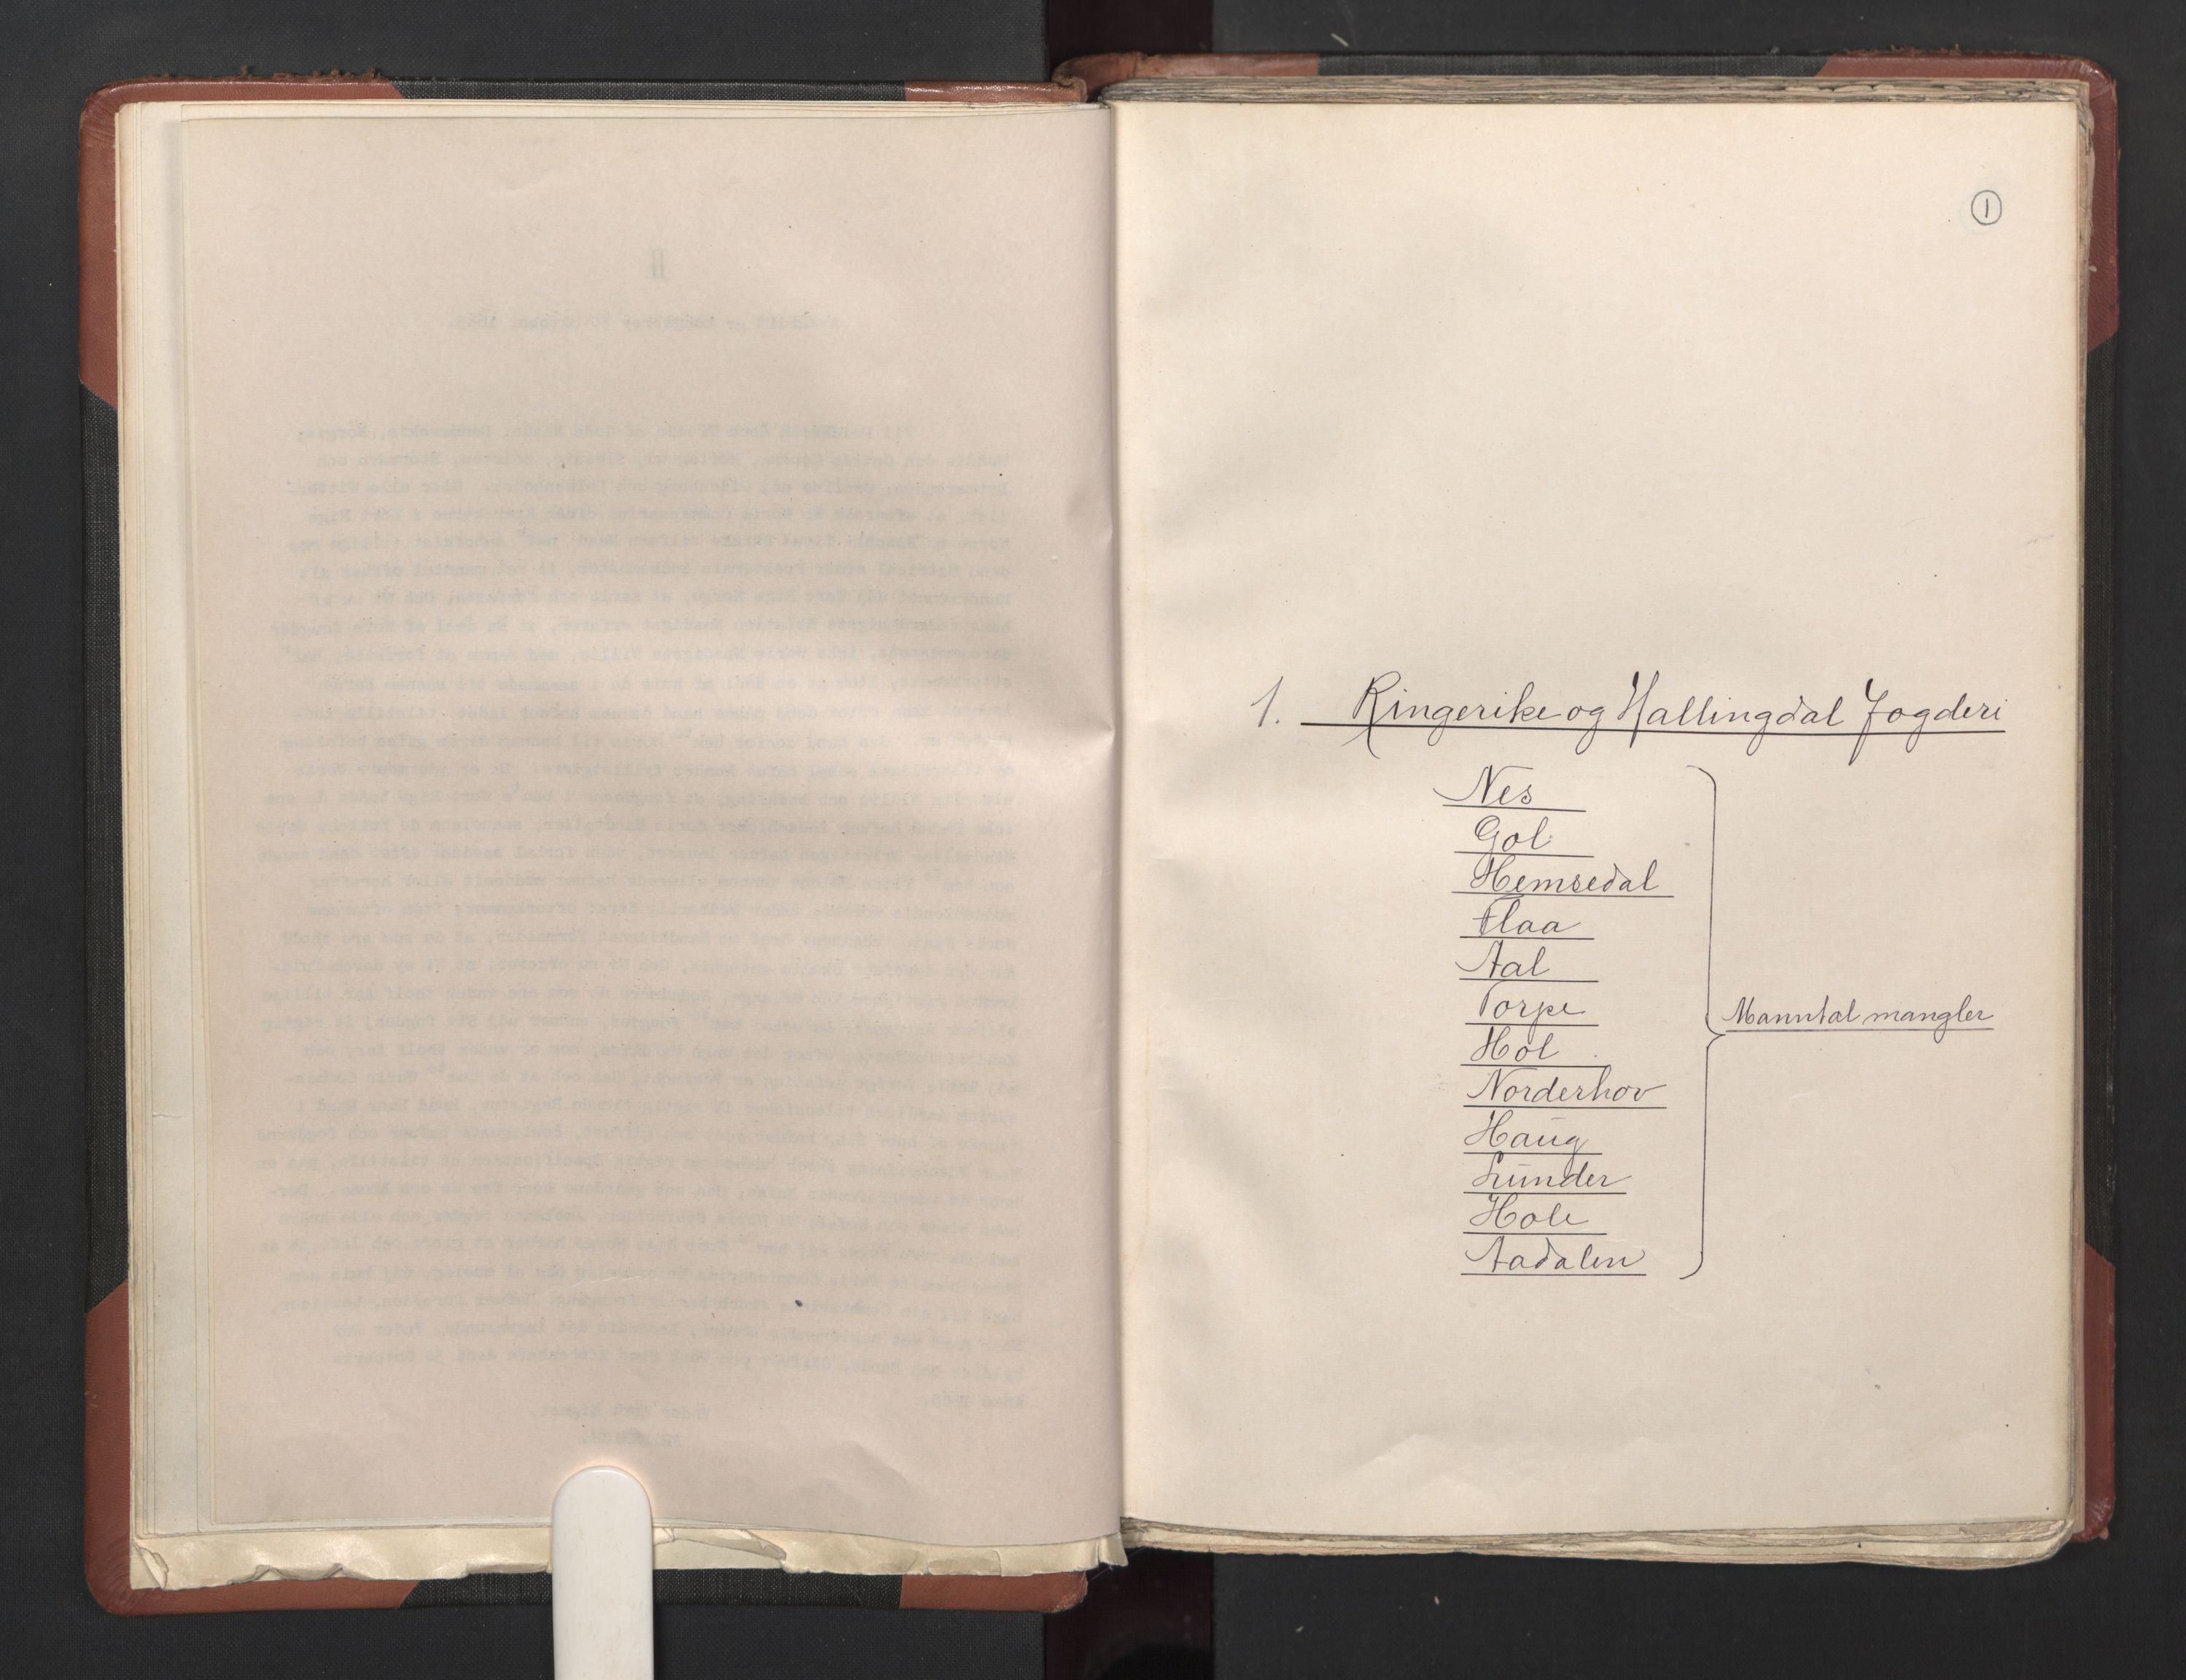 RA, Fogdenes og sorenskrivernes manntall 1664-1666, nr. 5: Fogderier (len og skipreider) i nåværende Buskerud fylke og Vestfold fylke, 1664, s. 1